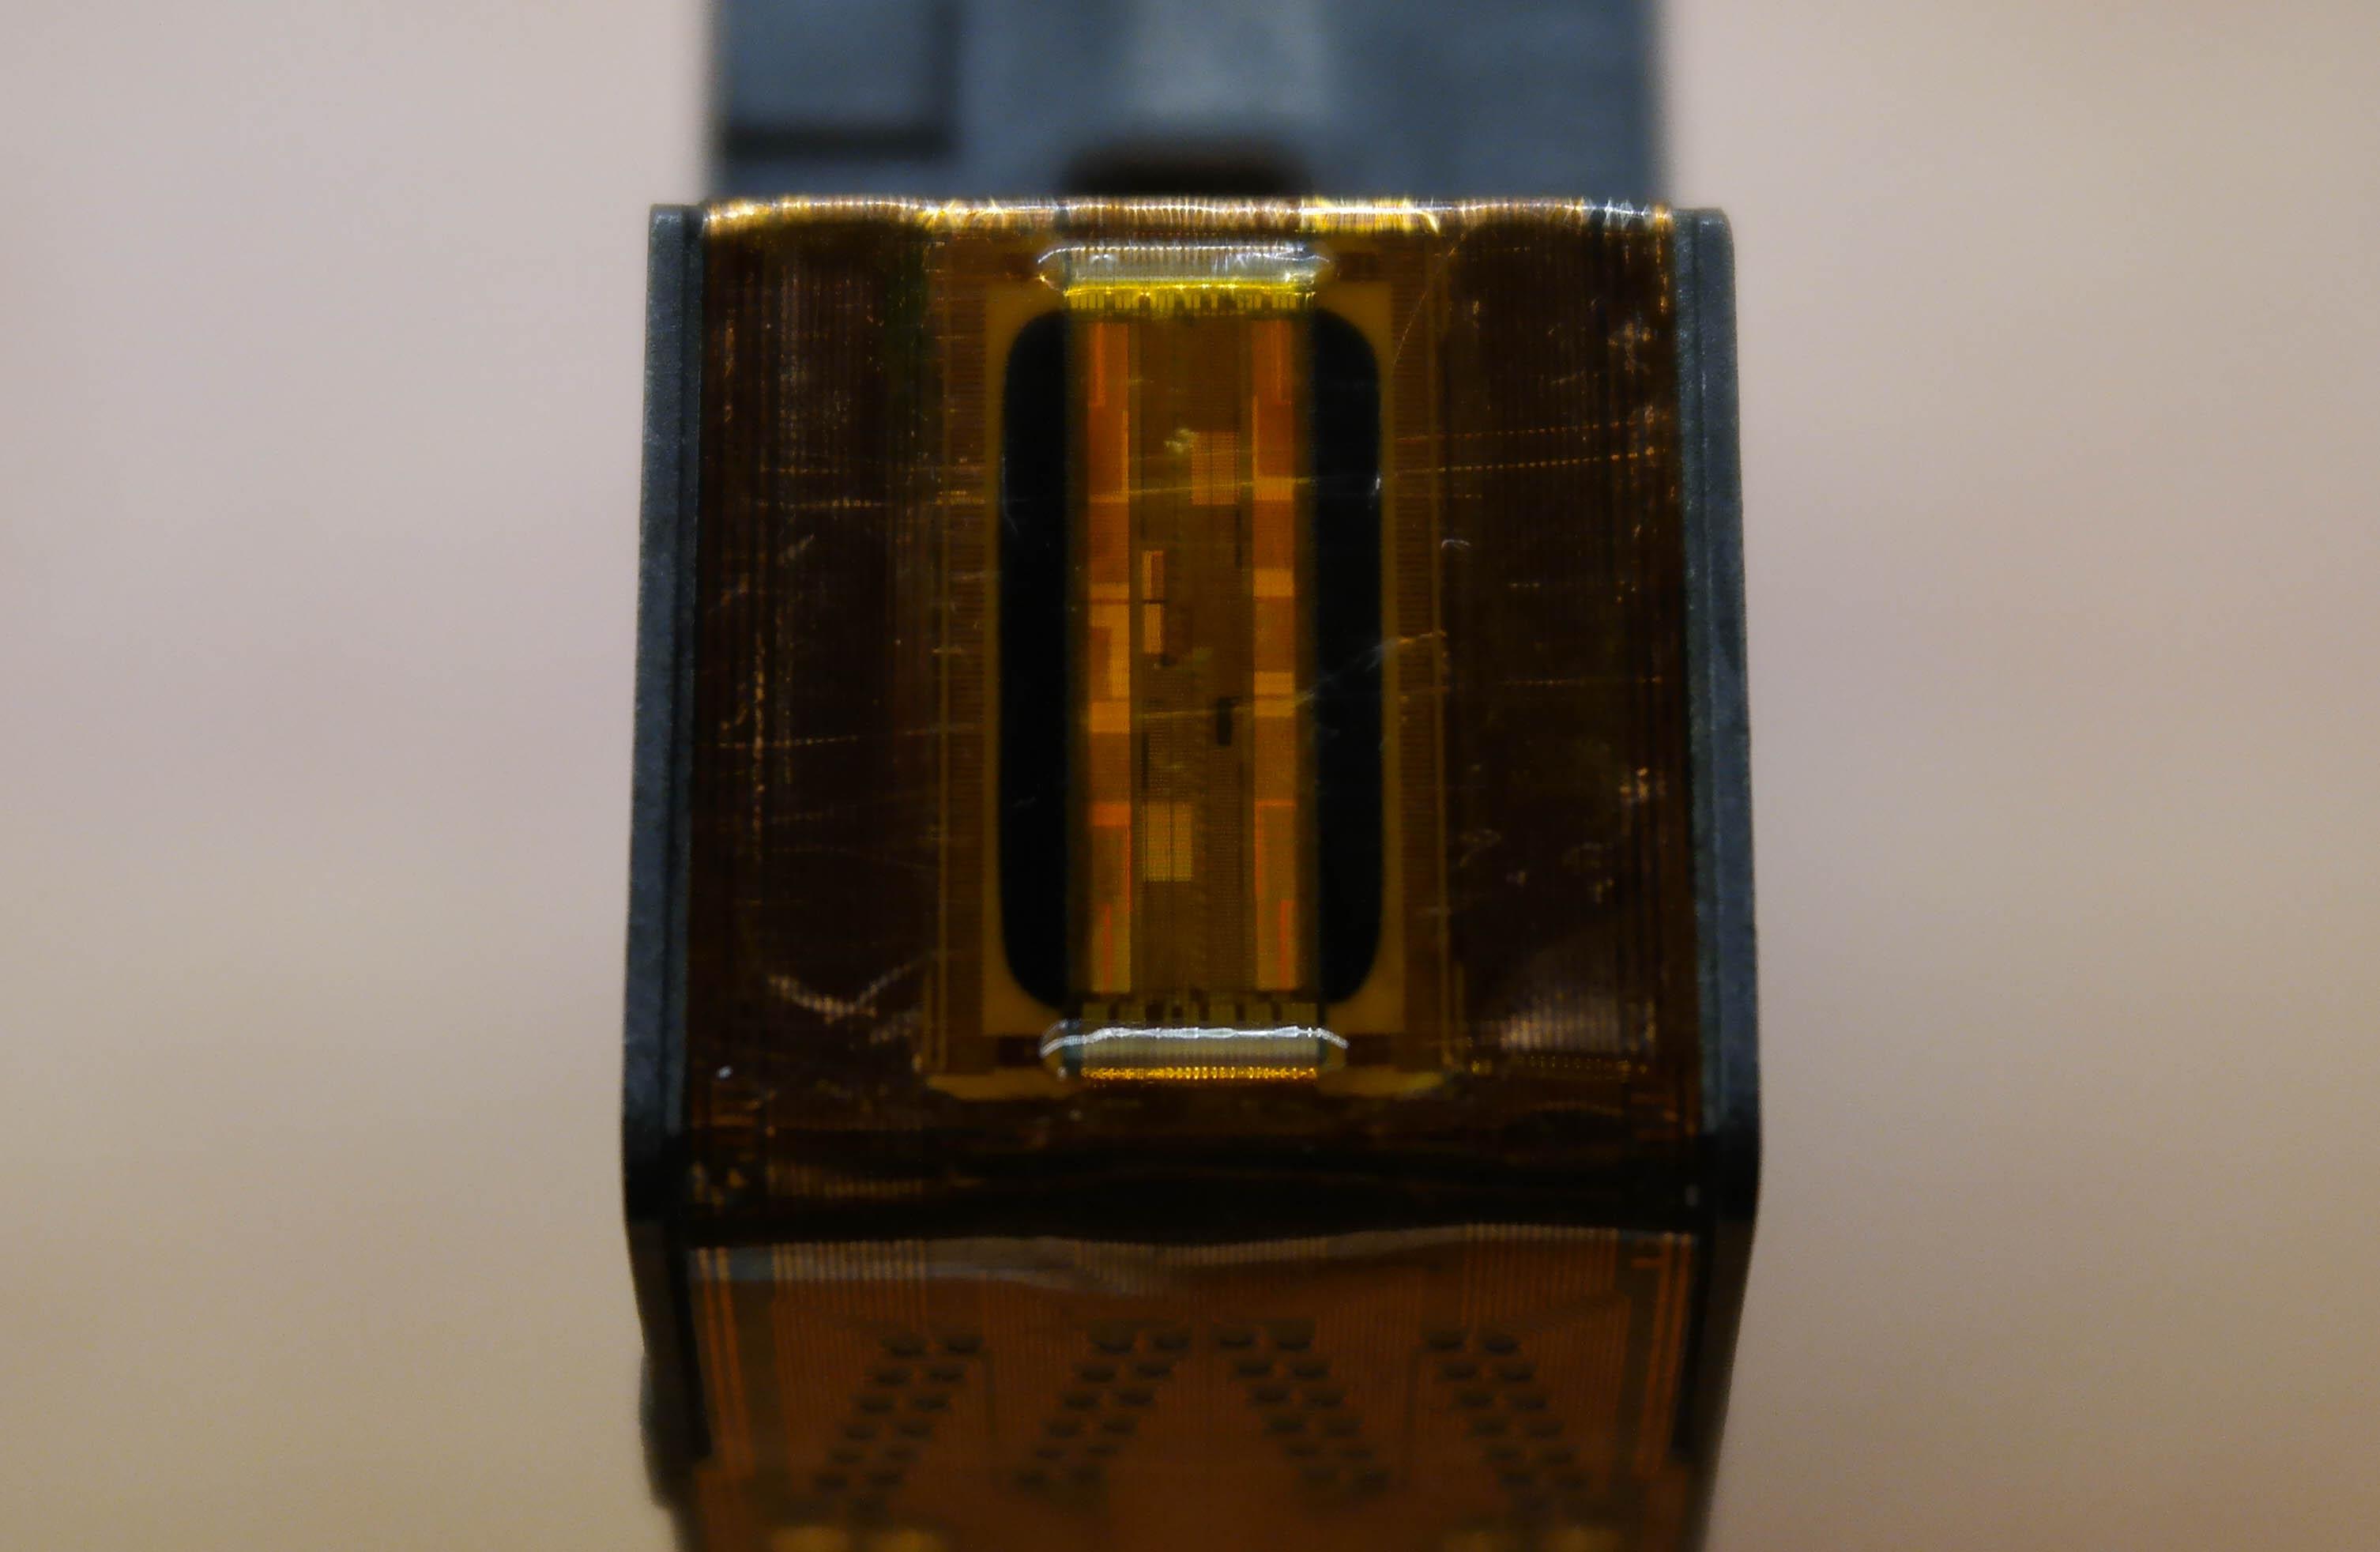 HP45 nozzle die closeup